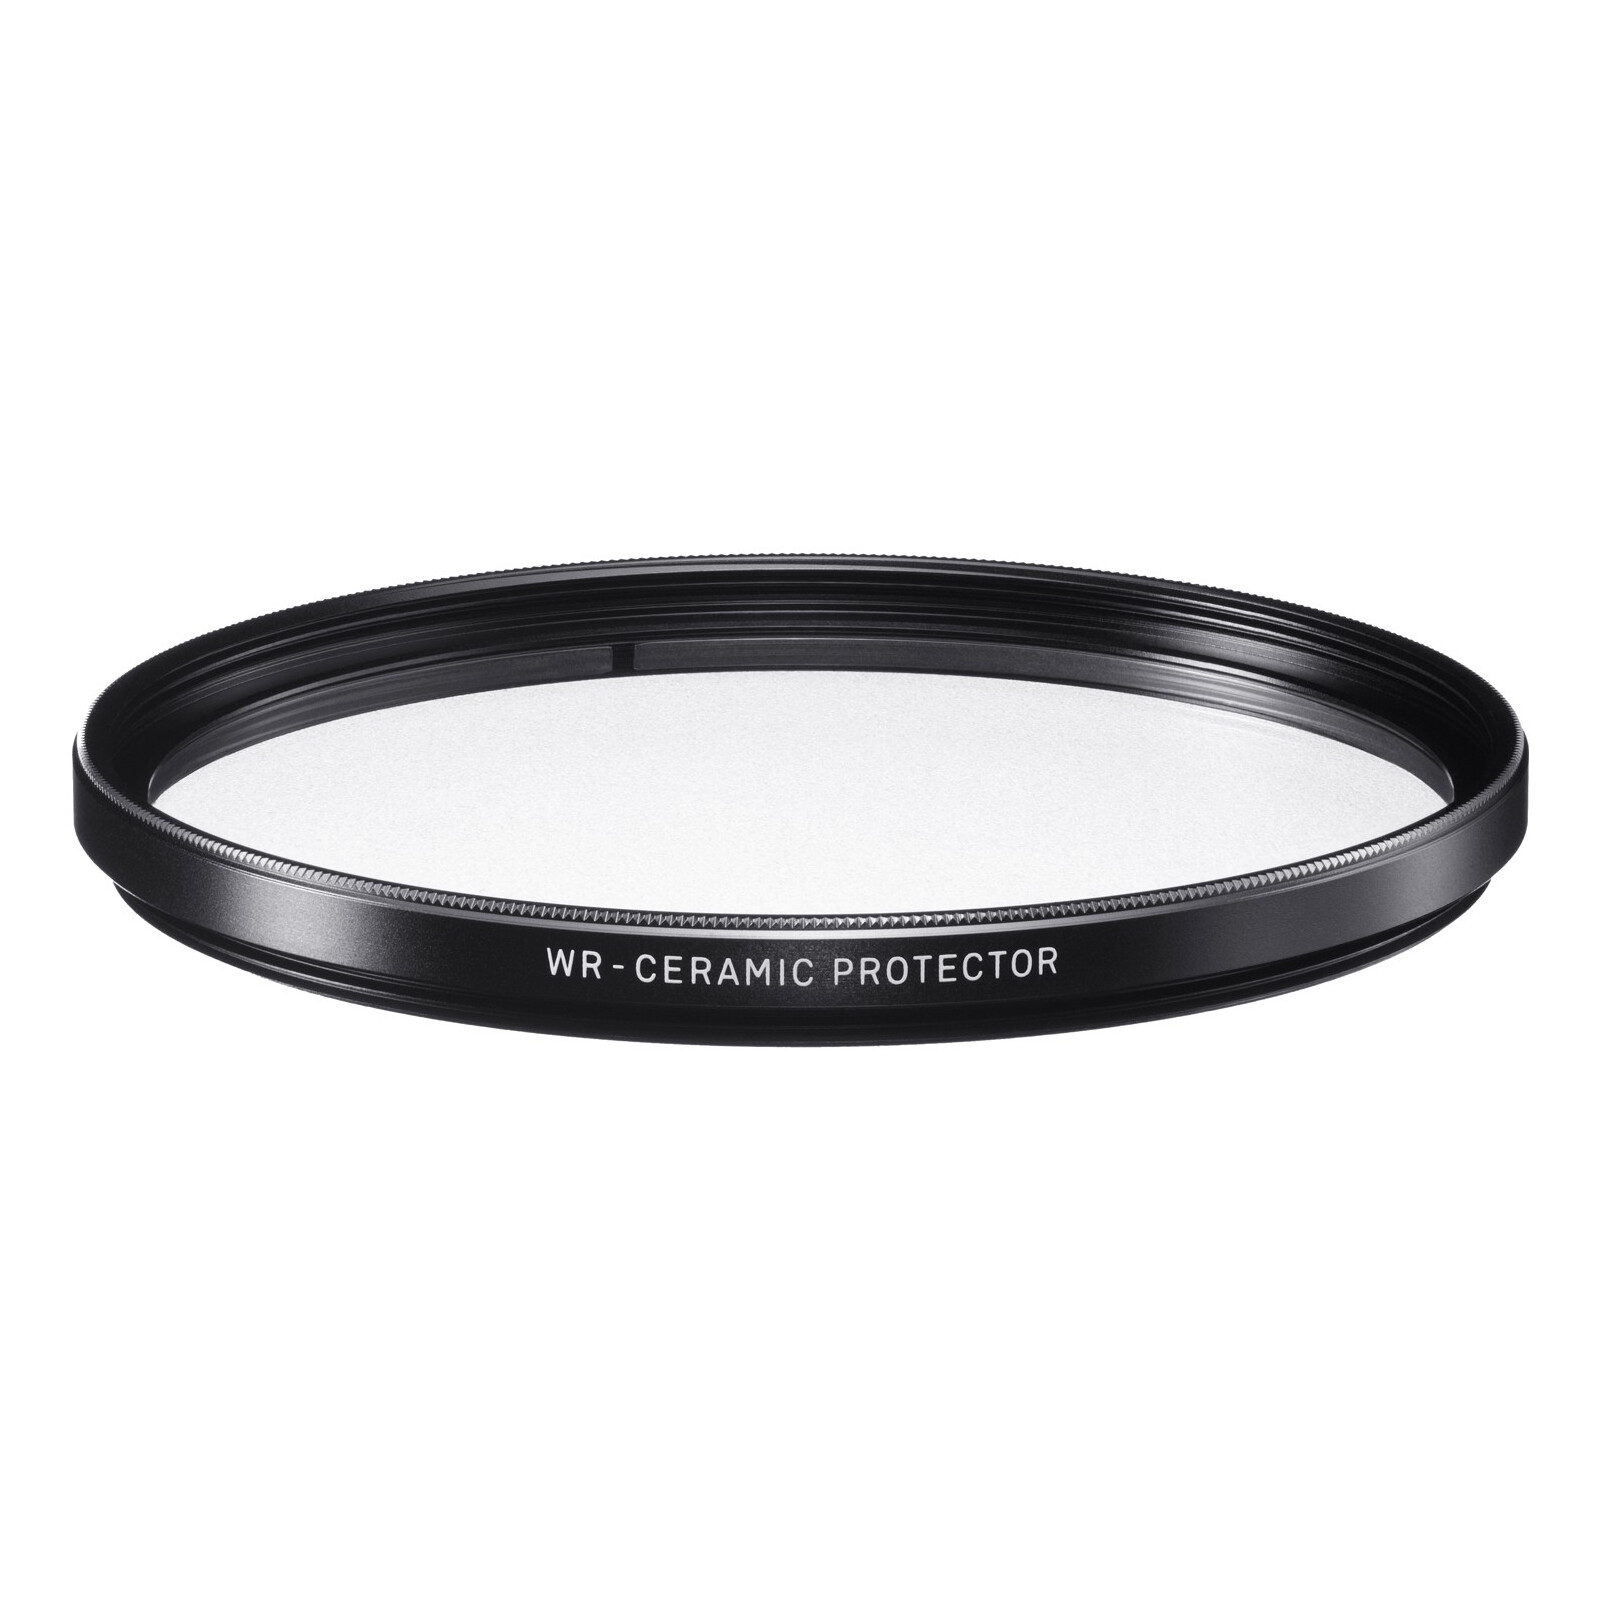 Sigma WR Ceramic Protector 77mm